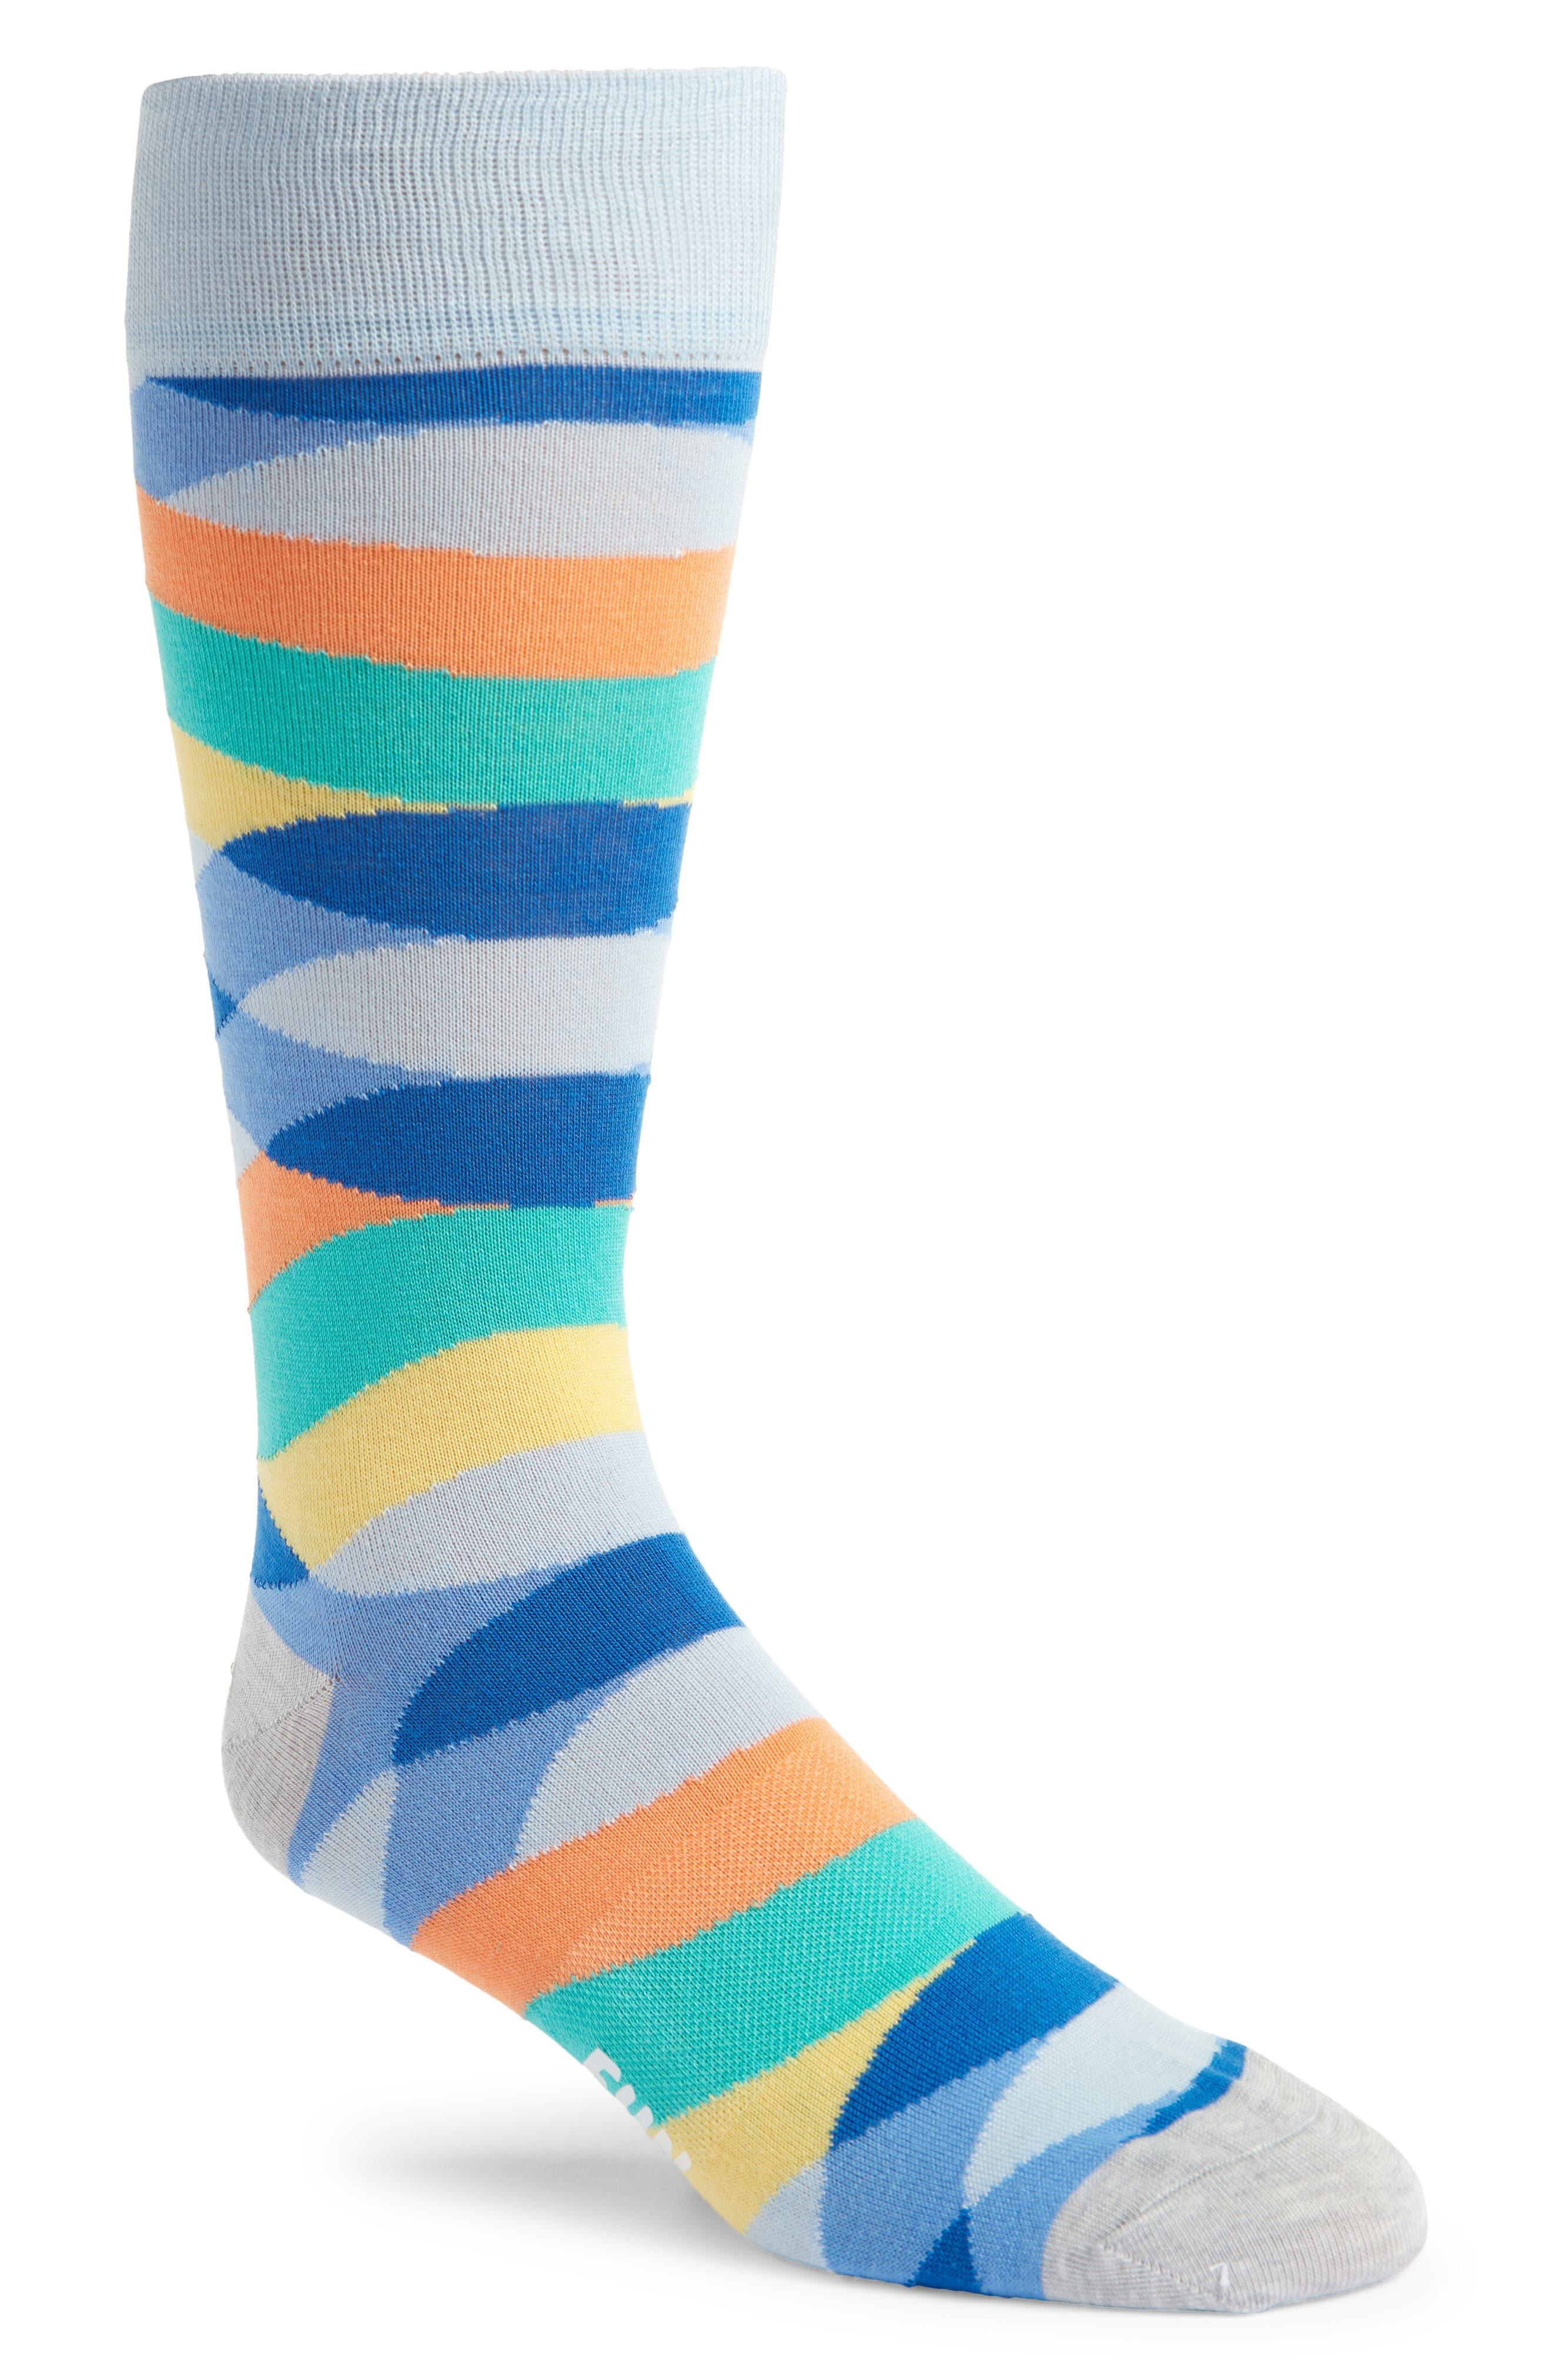 Men's Fun Socks Patterned Tall Socks